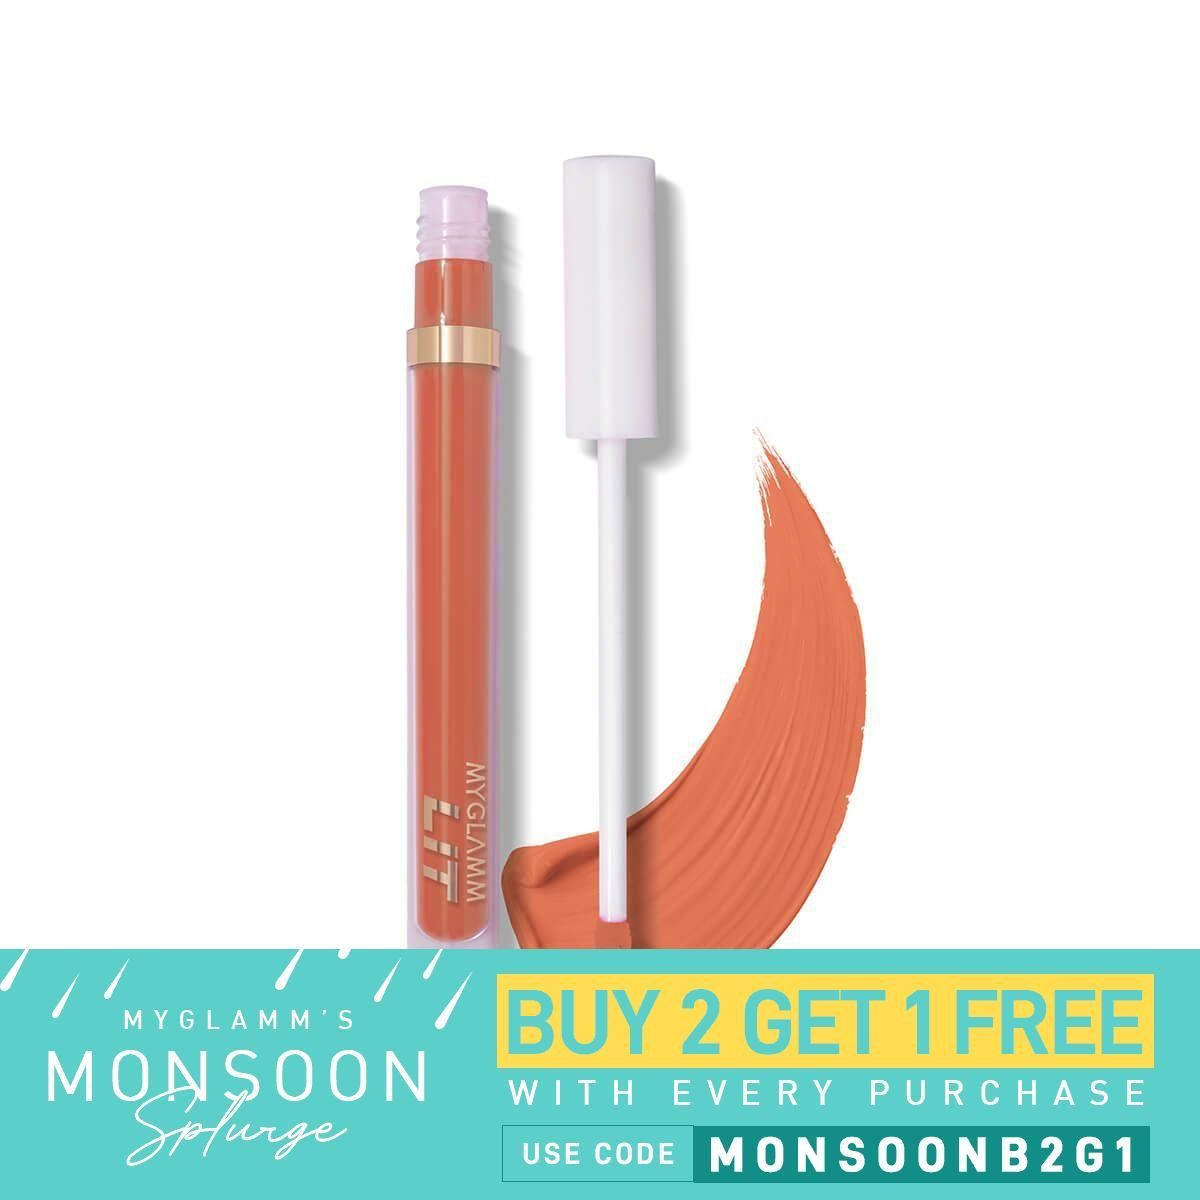 LIT Liquid Matte Lipstick - Stashing